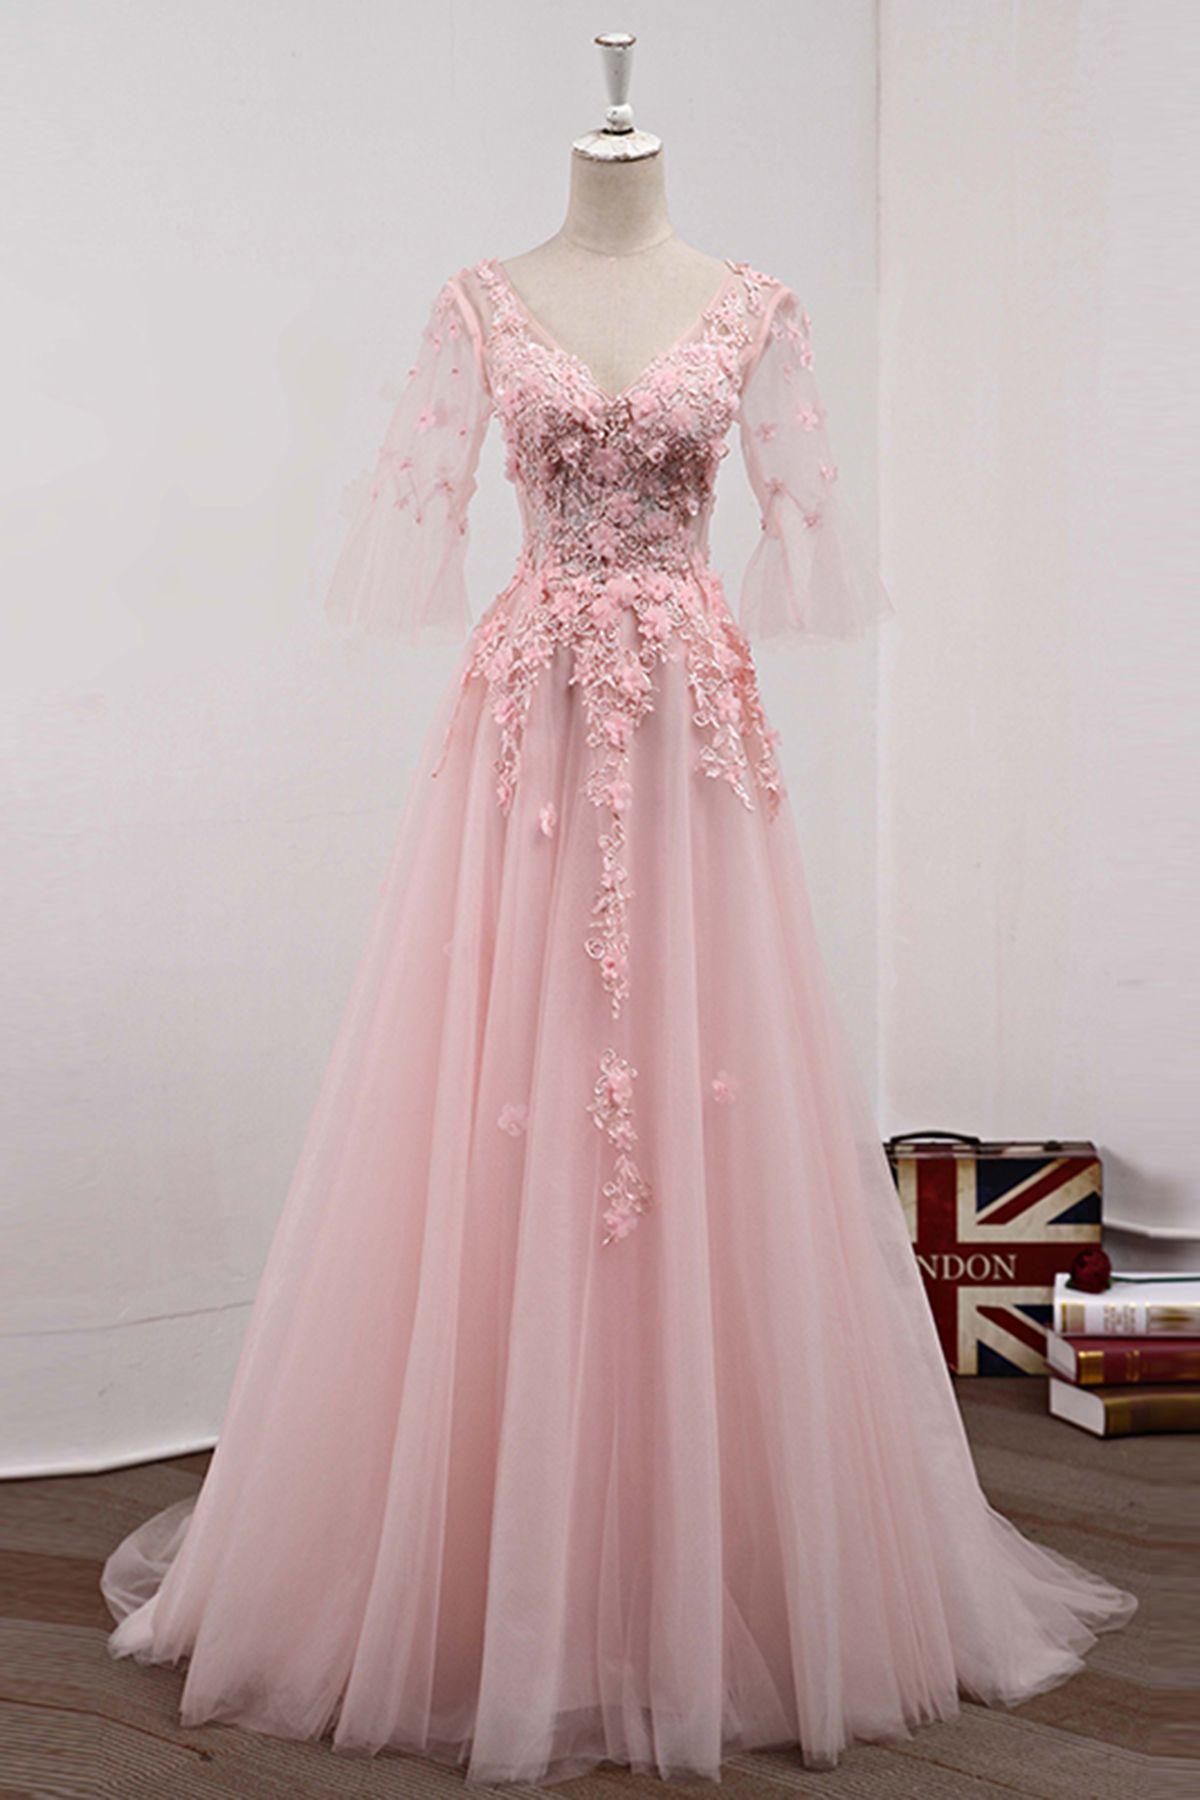 Royal Blue Sweet 16 Dresses Mf Dress Sweet 16 Dresses Prom Dresses Blue Dillards Prom Dress [ 1000 x 1000 Pixel ]